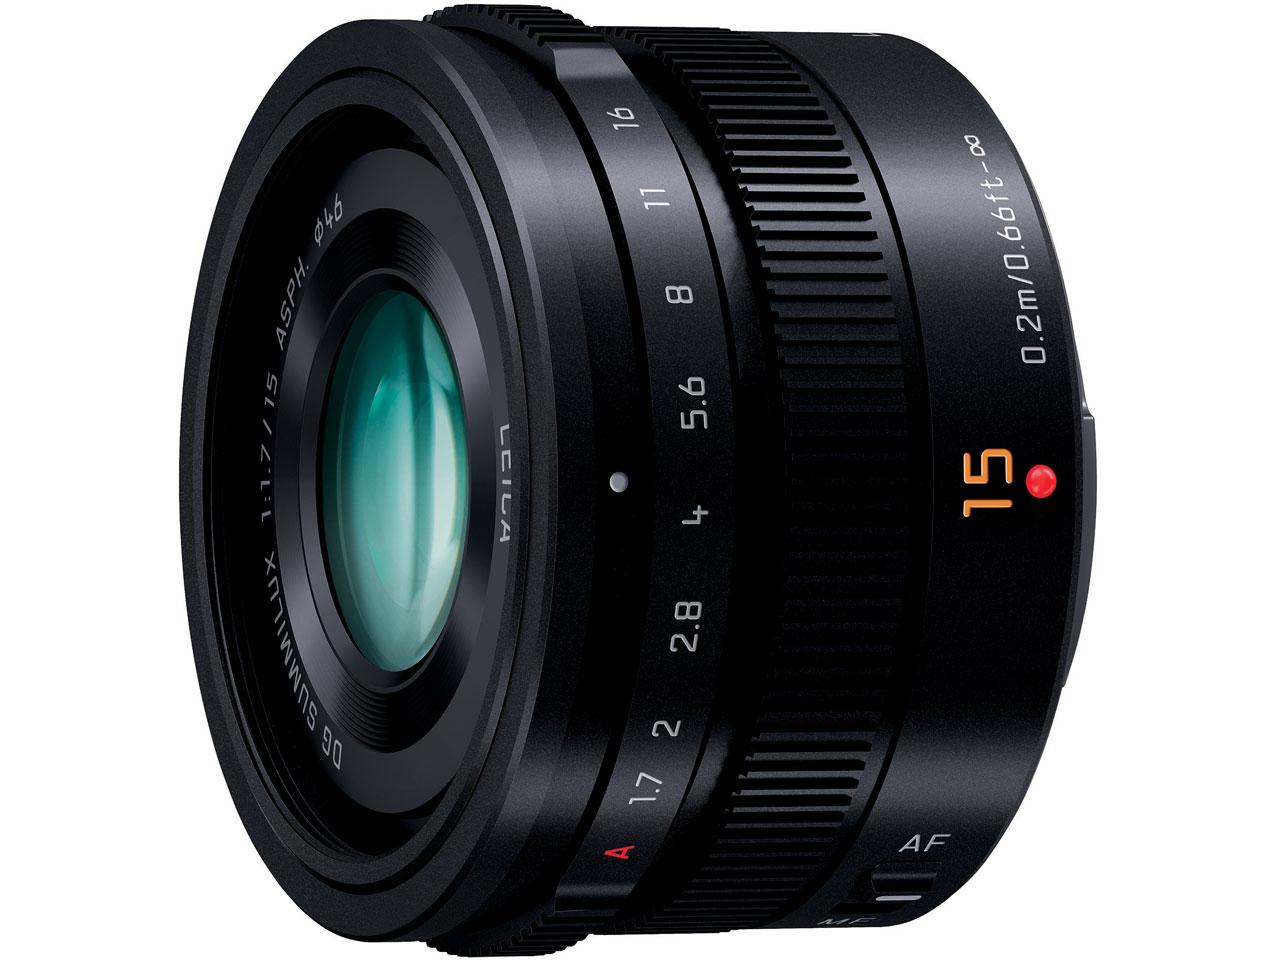 LEICA DG SUMMILUX 15mm/F1.7 ASPH. H-X015-K [ブラック] の製品画像